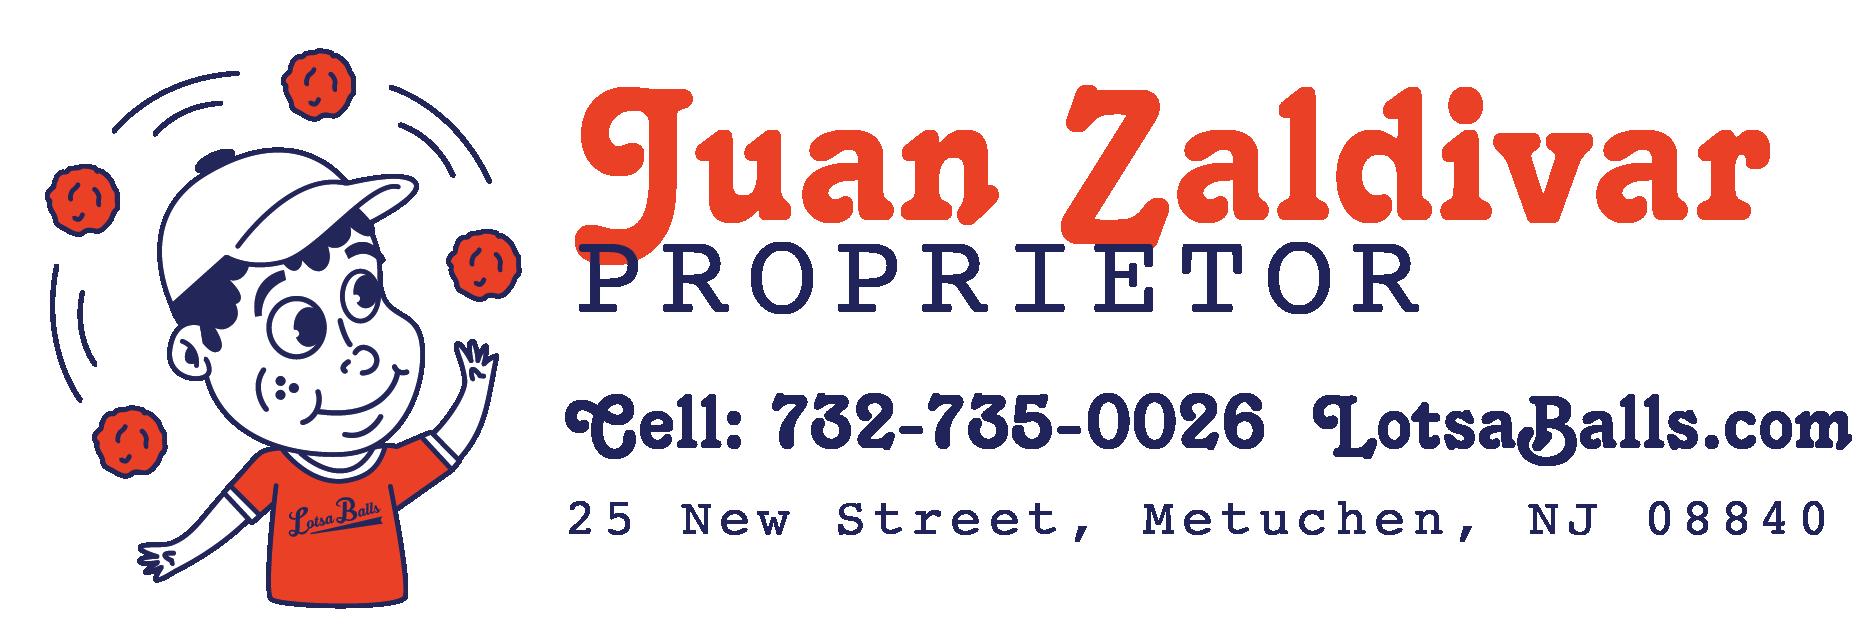 LOT-Email-Signature-Selections-Juan-01-02.png